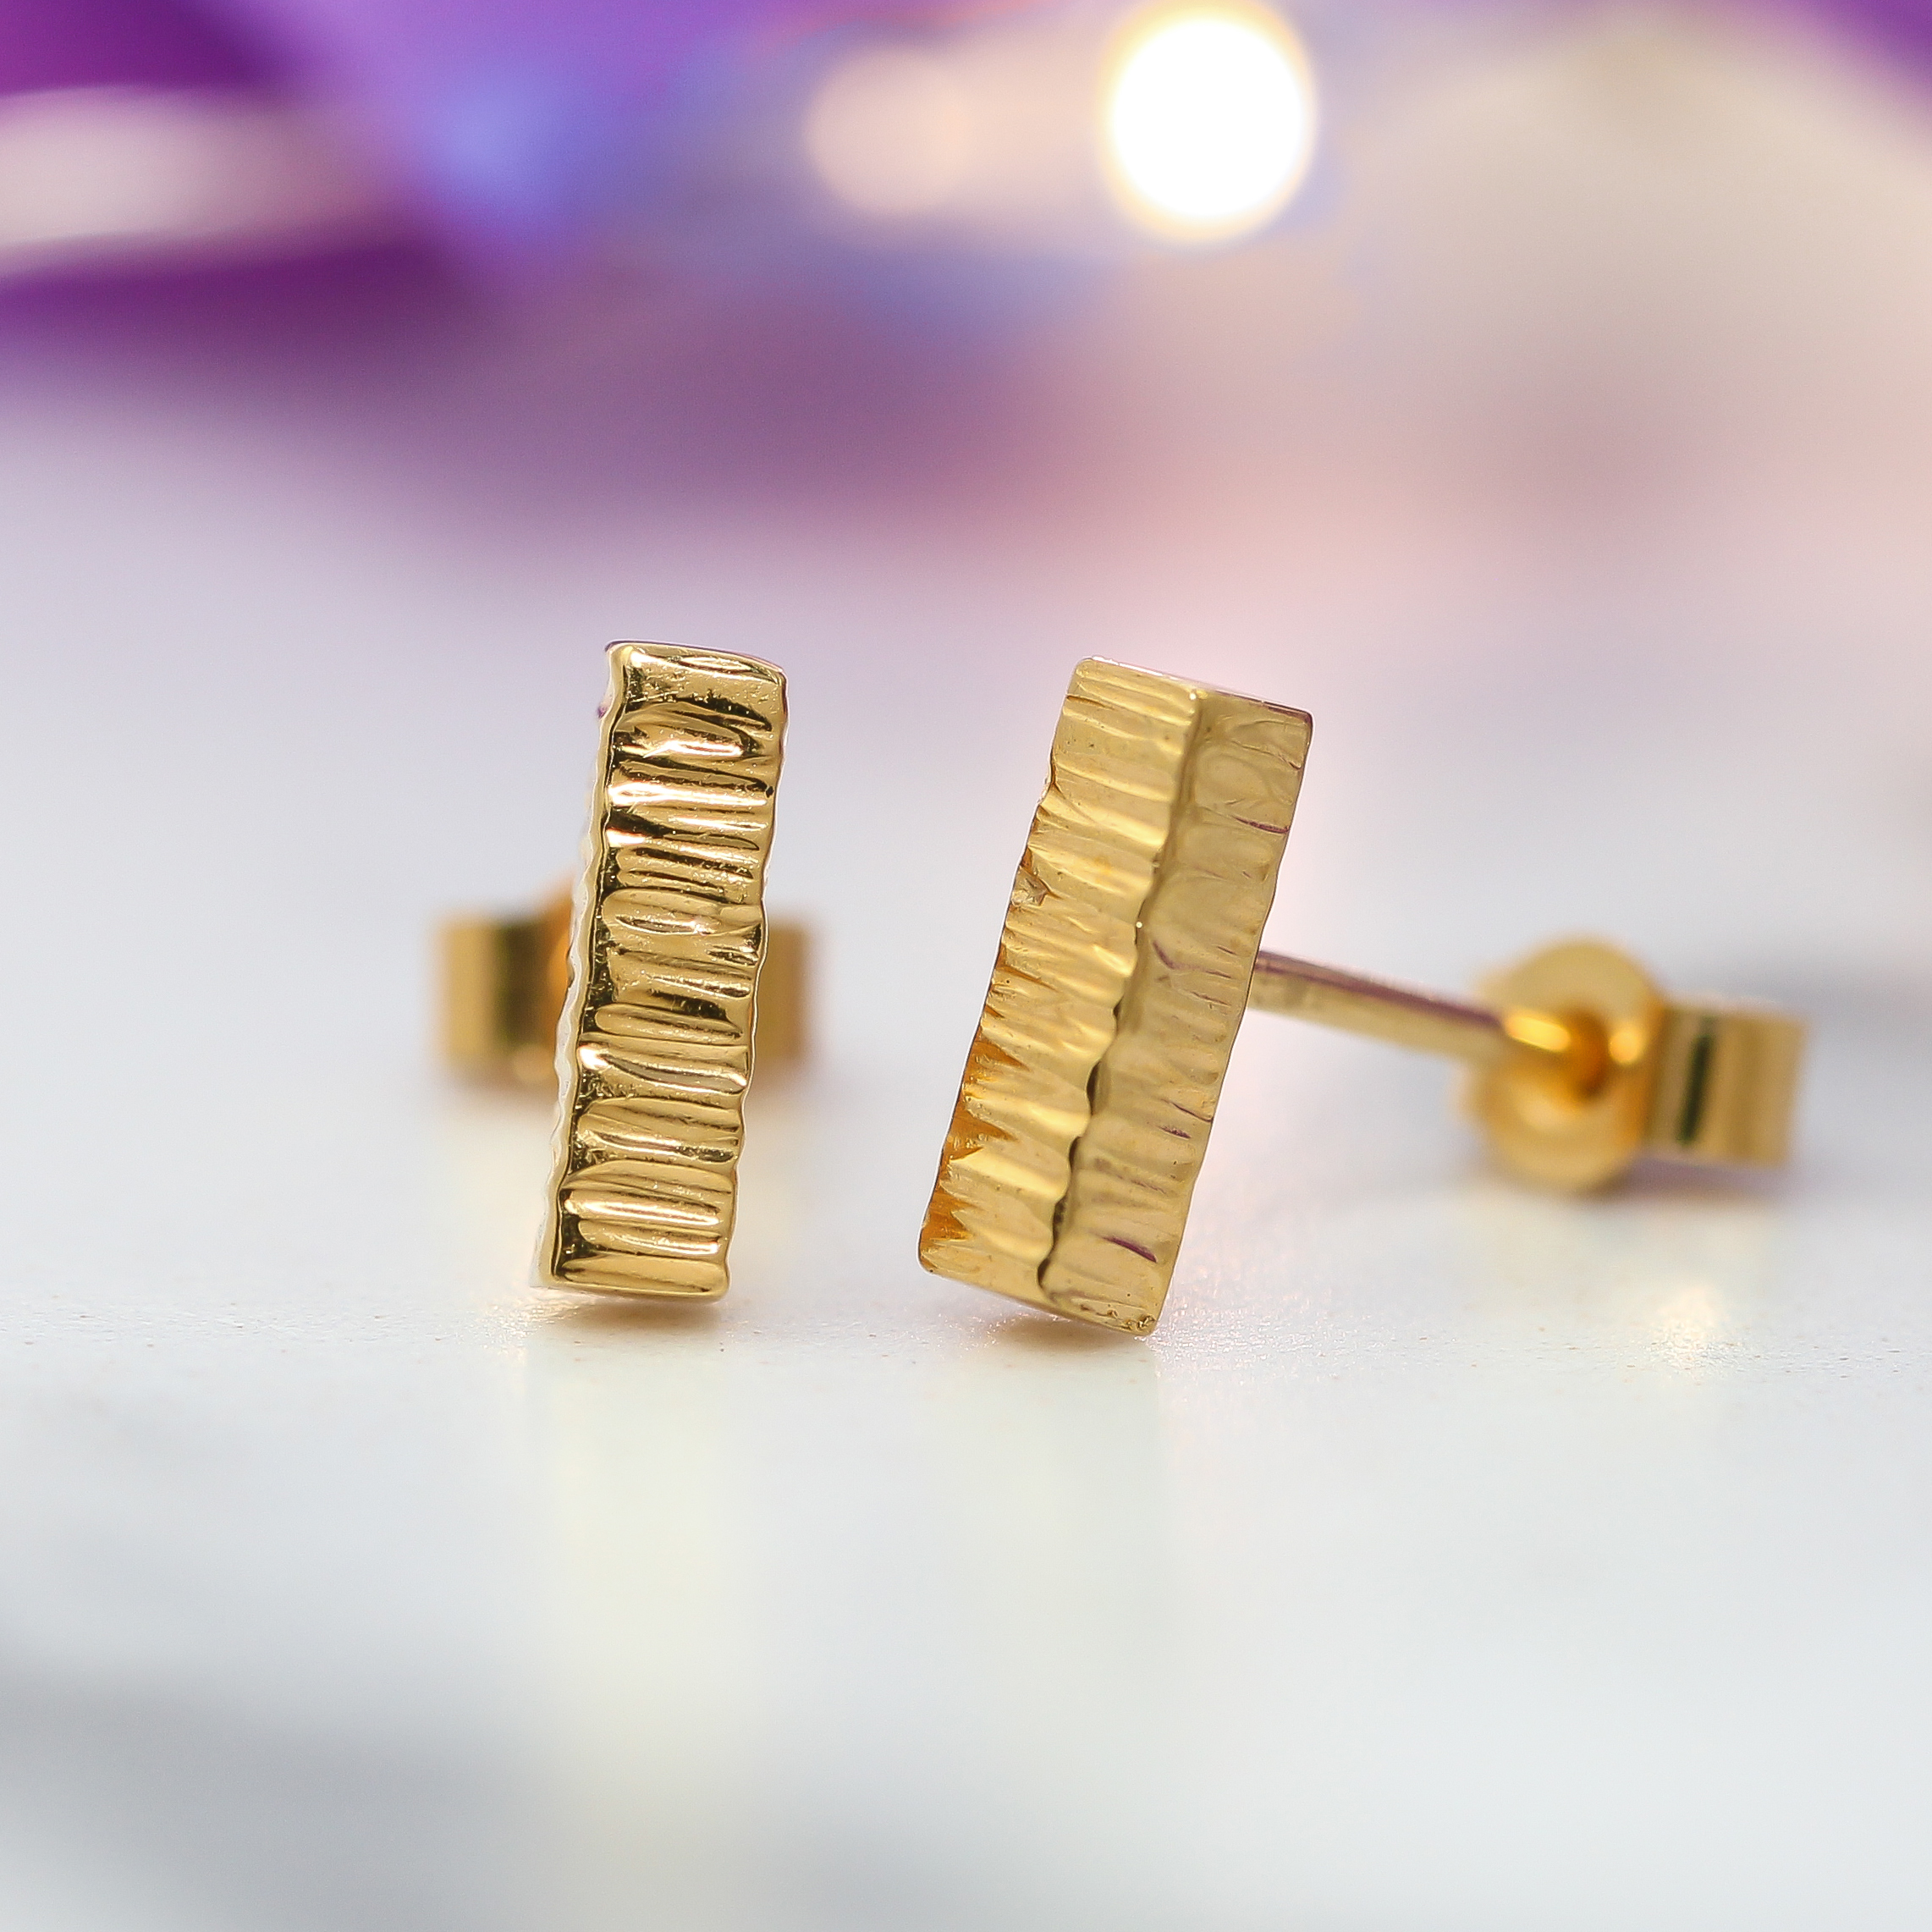 18 k gold vermeil earring studs hammered square bar